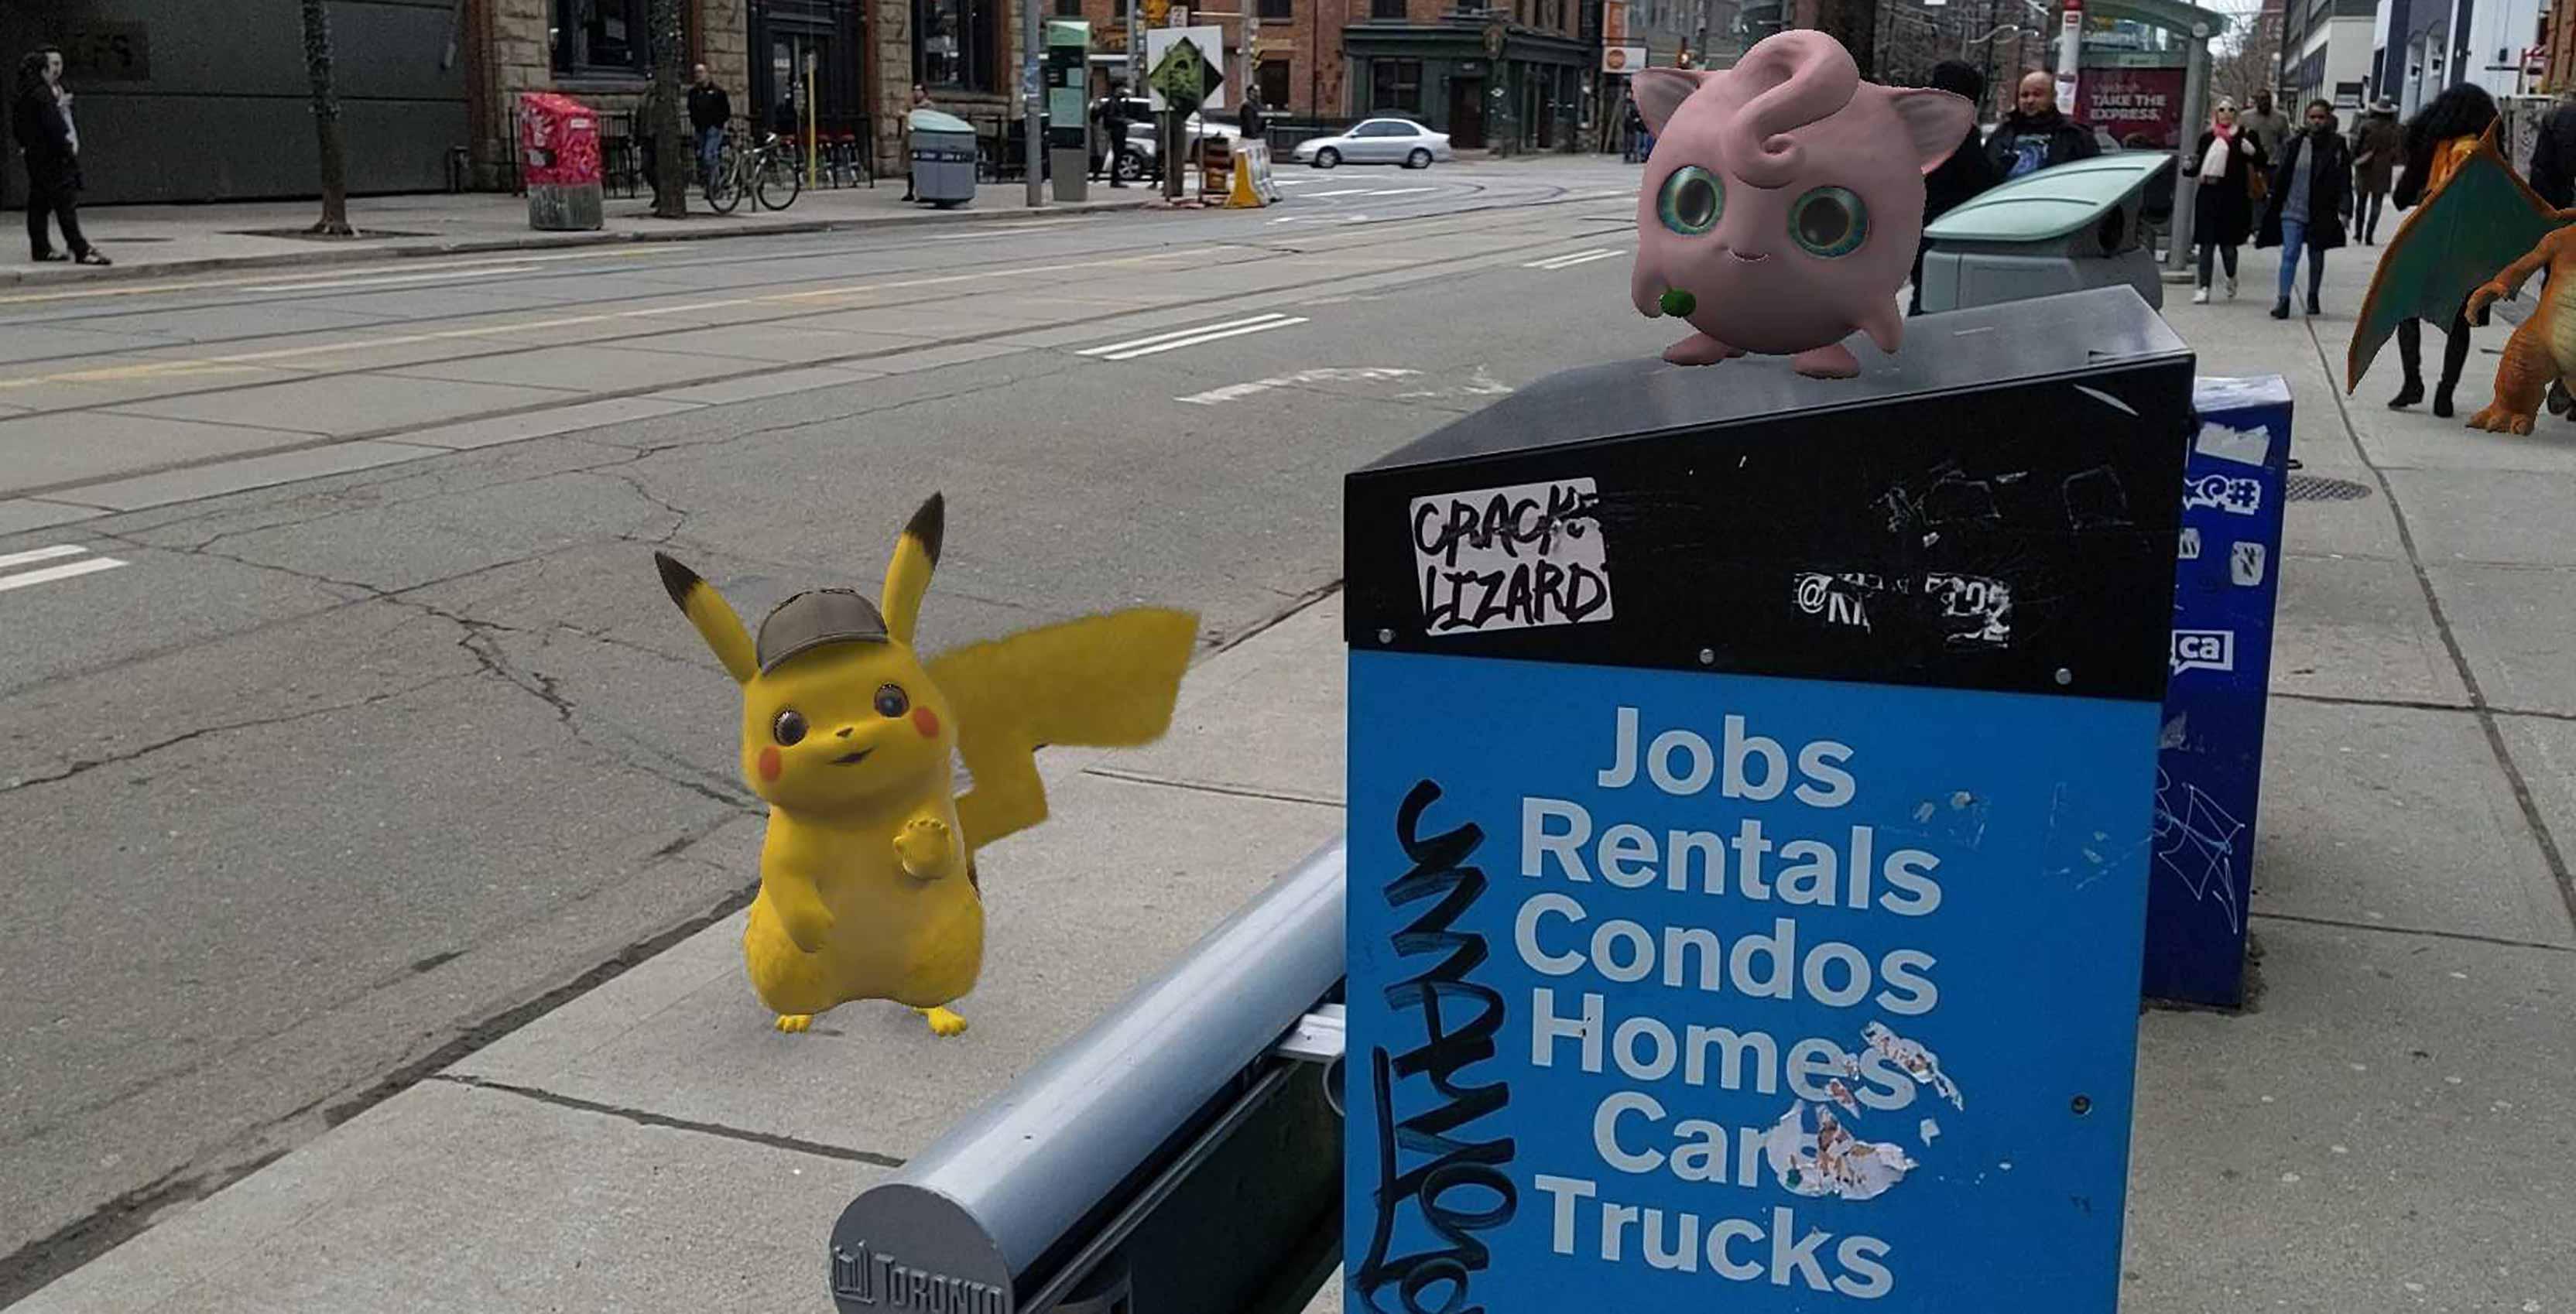 Detective Pikachu AR stickers